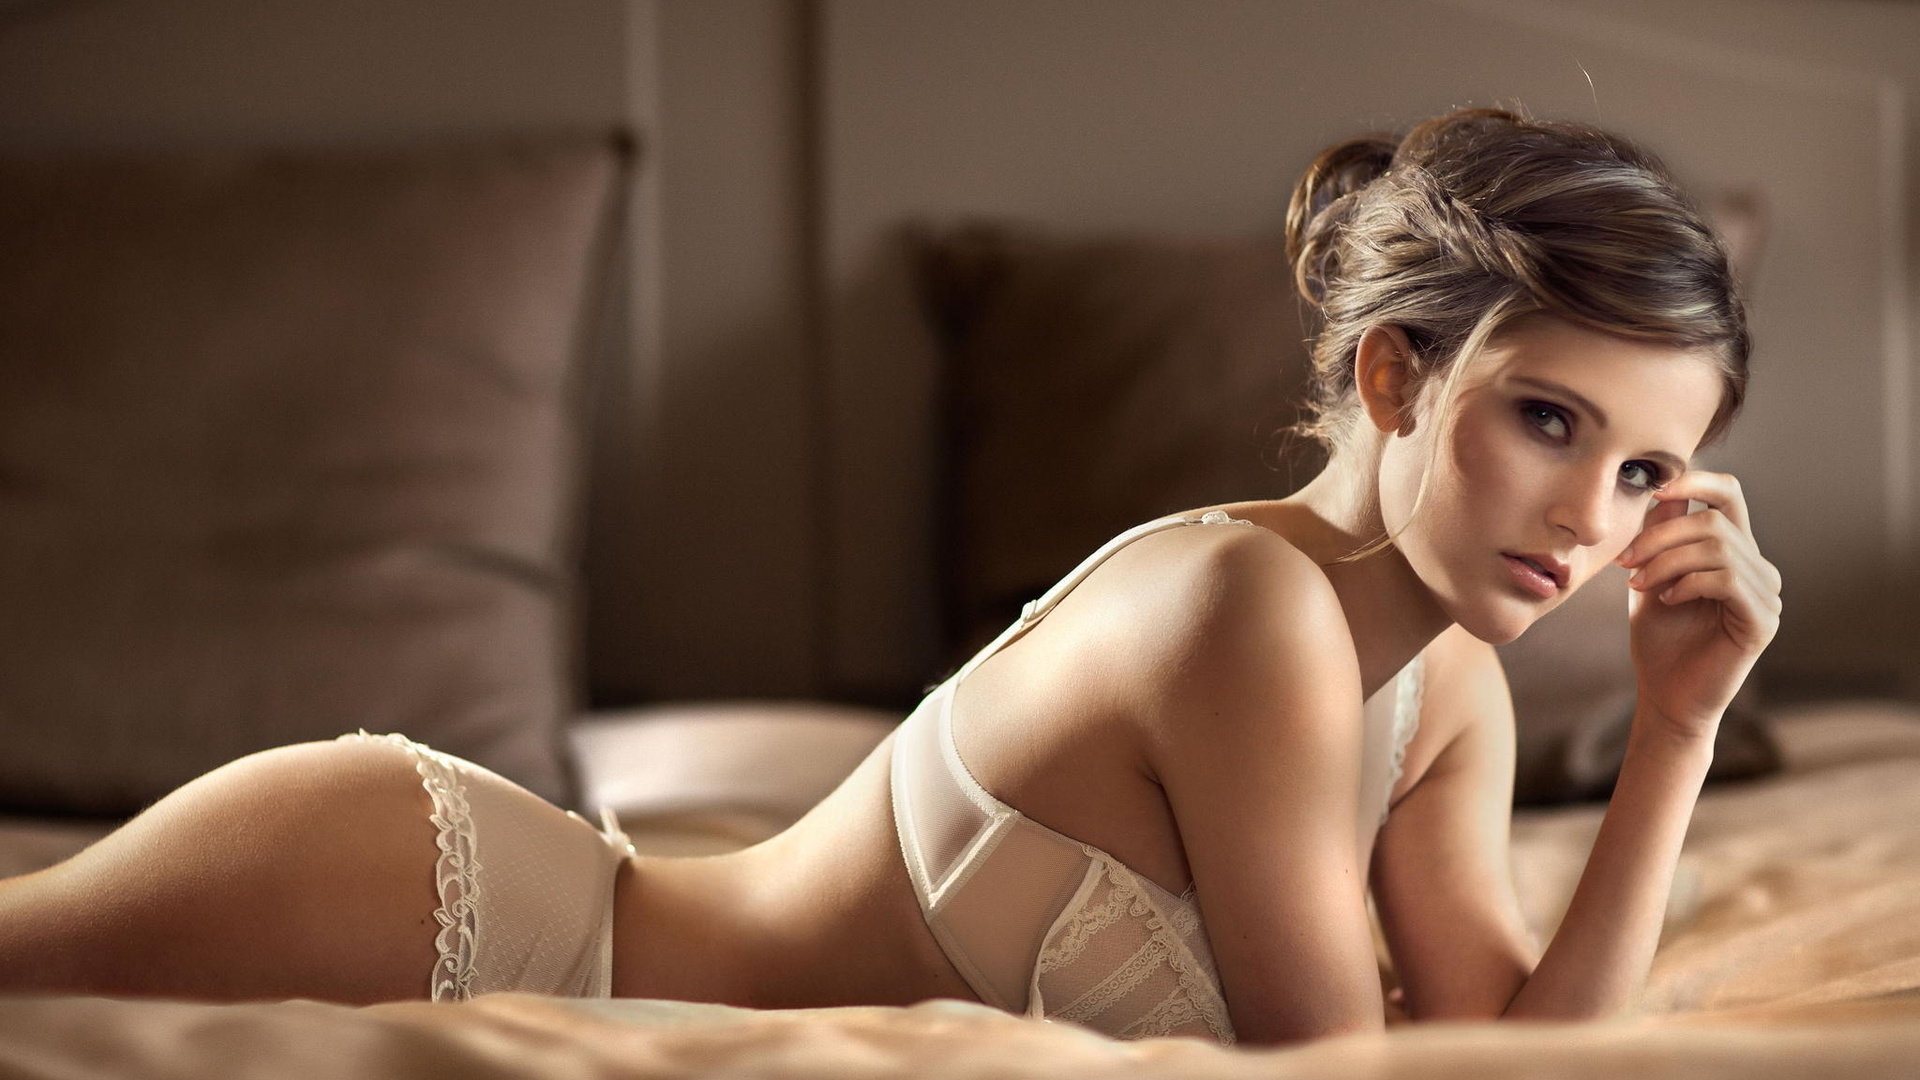 Katherine webb nude naked